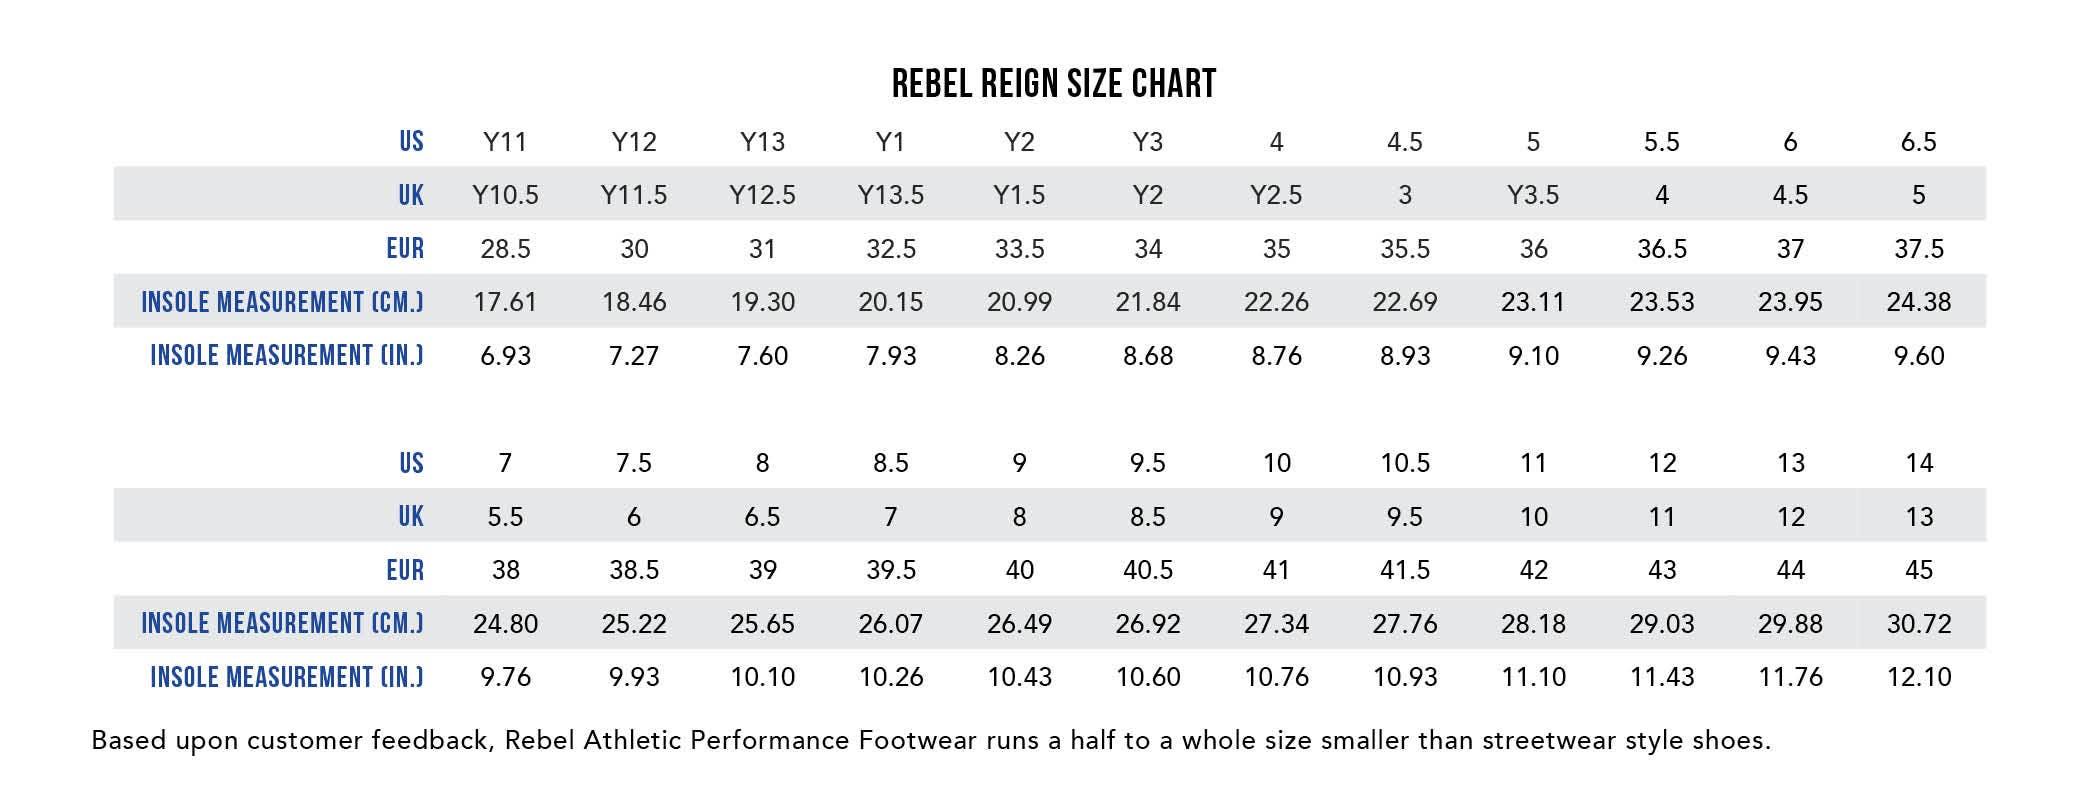 Reign Size Chart